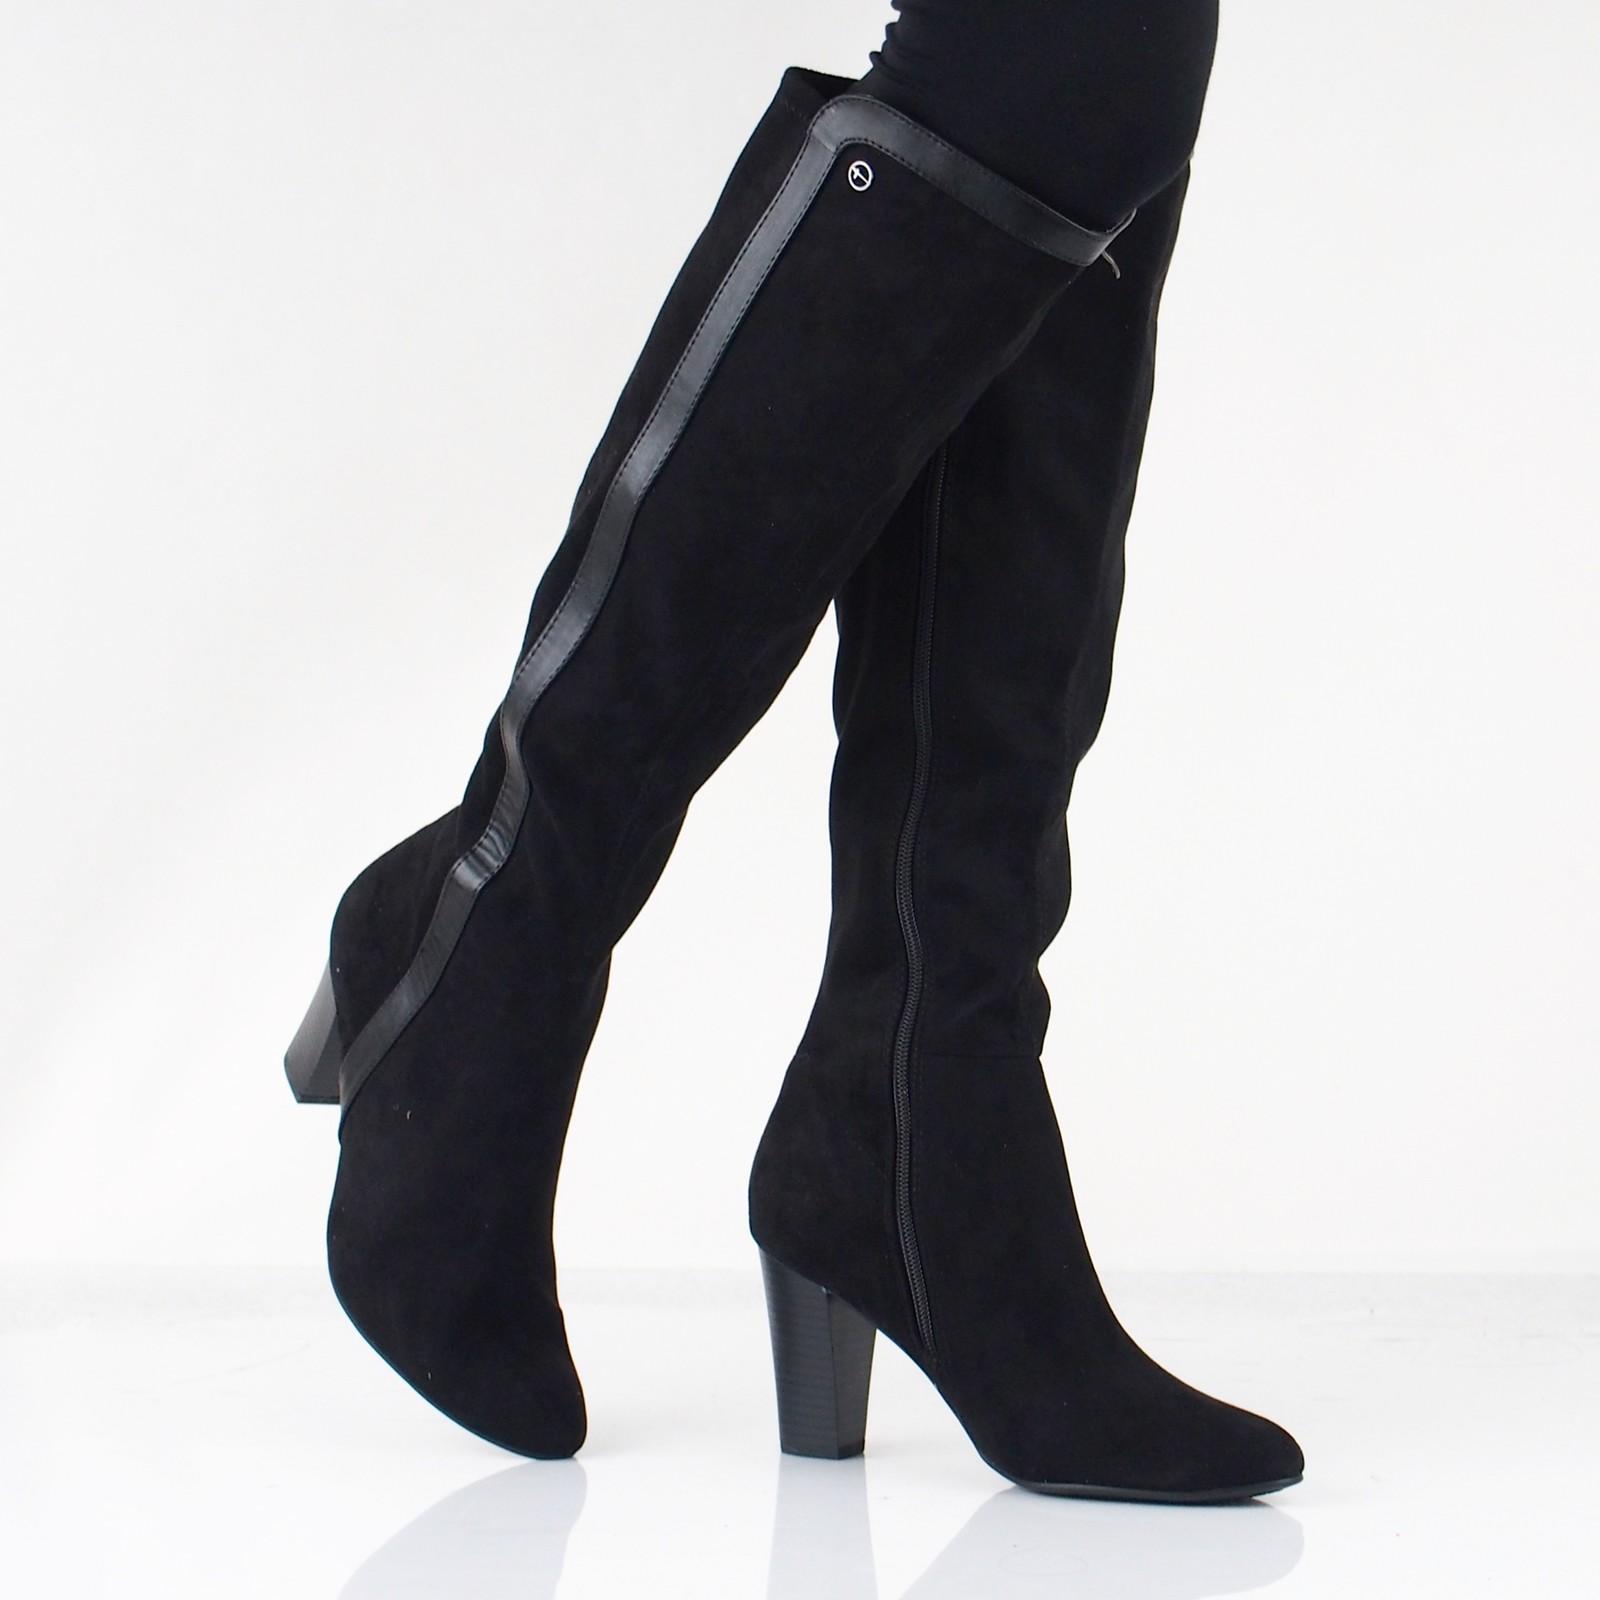 fc26176ed4ed0 Tamaris dámske vysoké štýlové čižmy - čierne | 2551421-BLK www.robel.sk